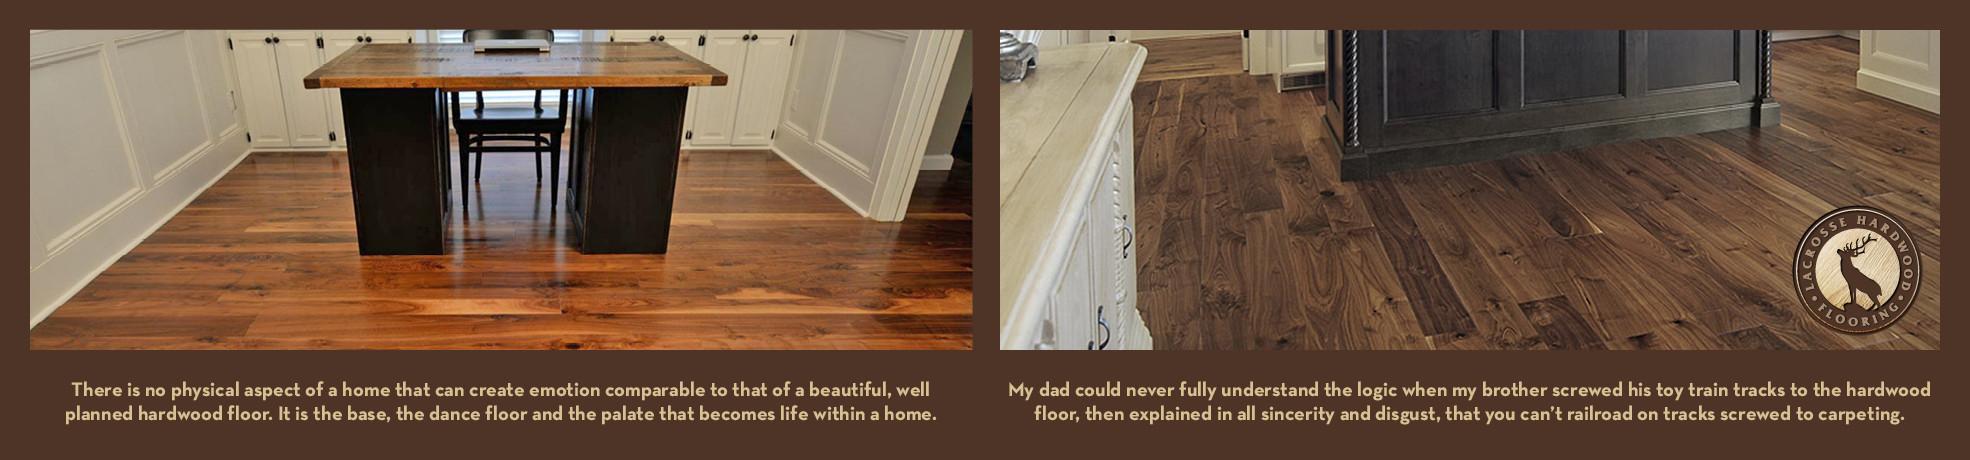 cost to refinish hardwood floors atlanta of lacrosse hardwood flooring walnut white oak red oak hickory throughout lhfsliderv22